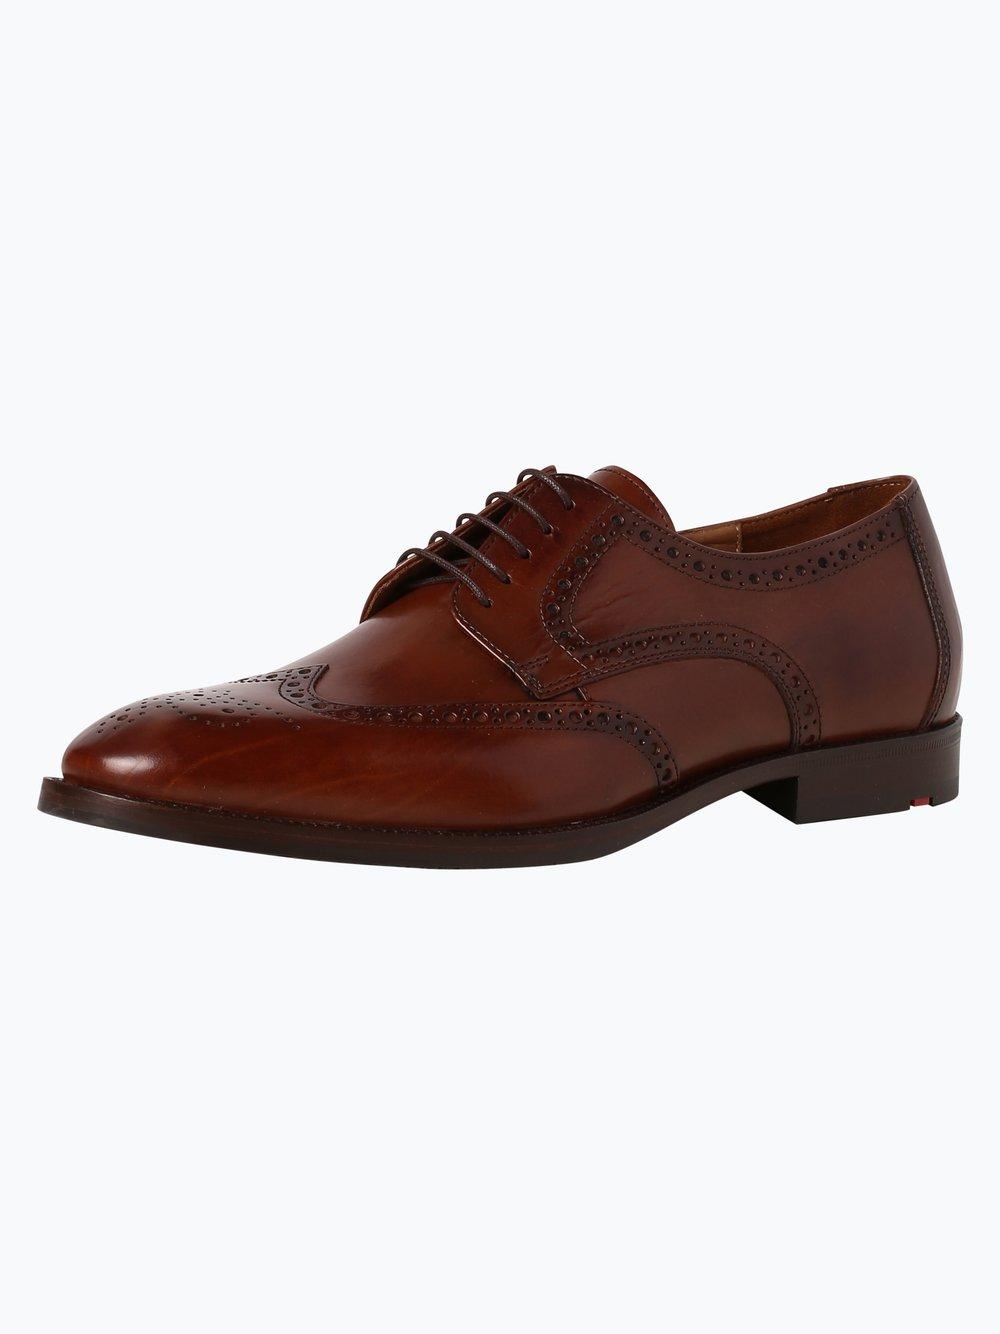 Lloyd – Męskie buty sznurowane ze skóry – Lucien, beżowy Van Graaf 341123-0005-00085